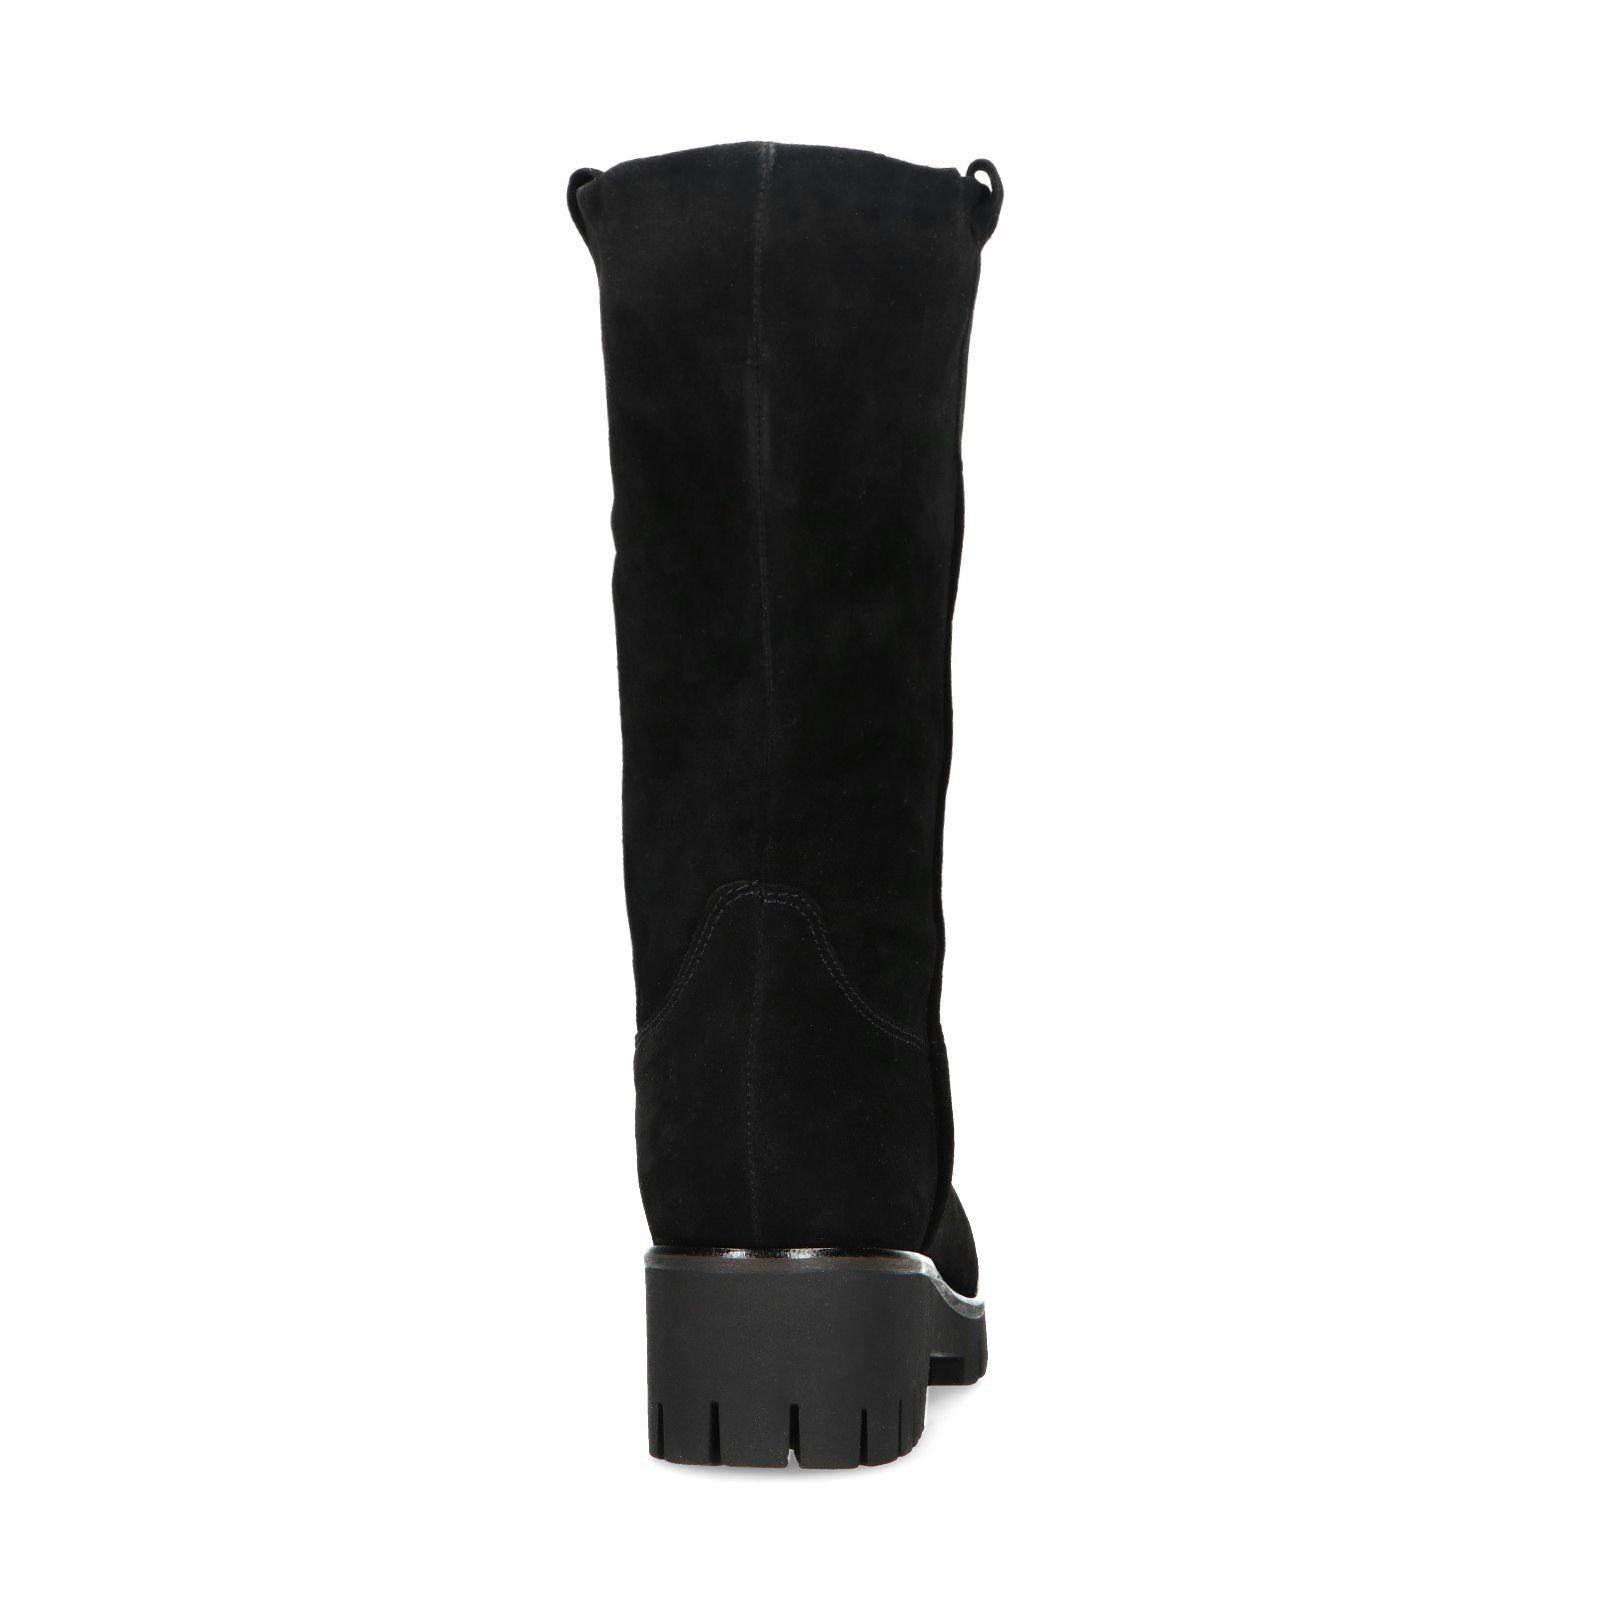 Sacha Kurze schwarze Stiefel aus Veloursleder